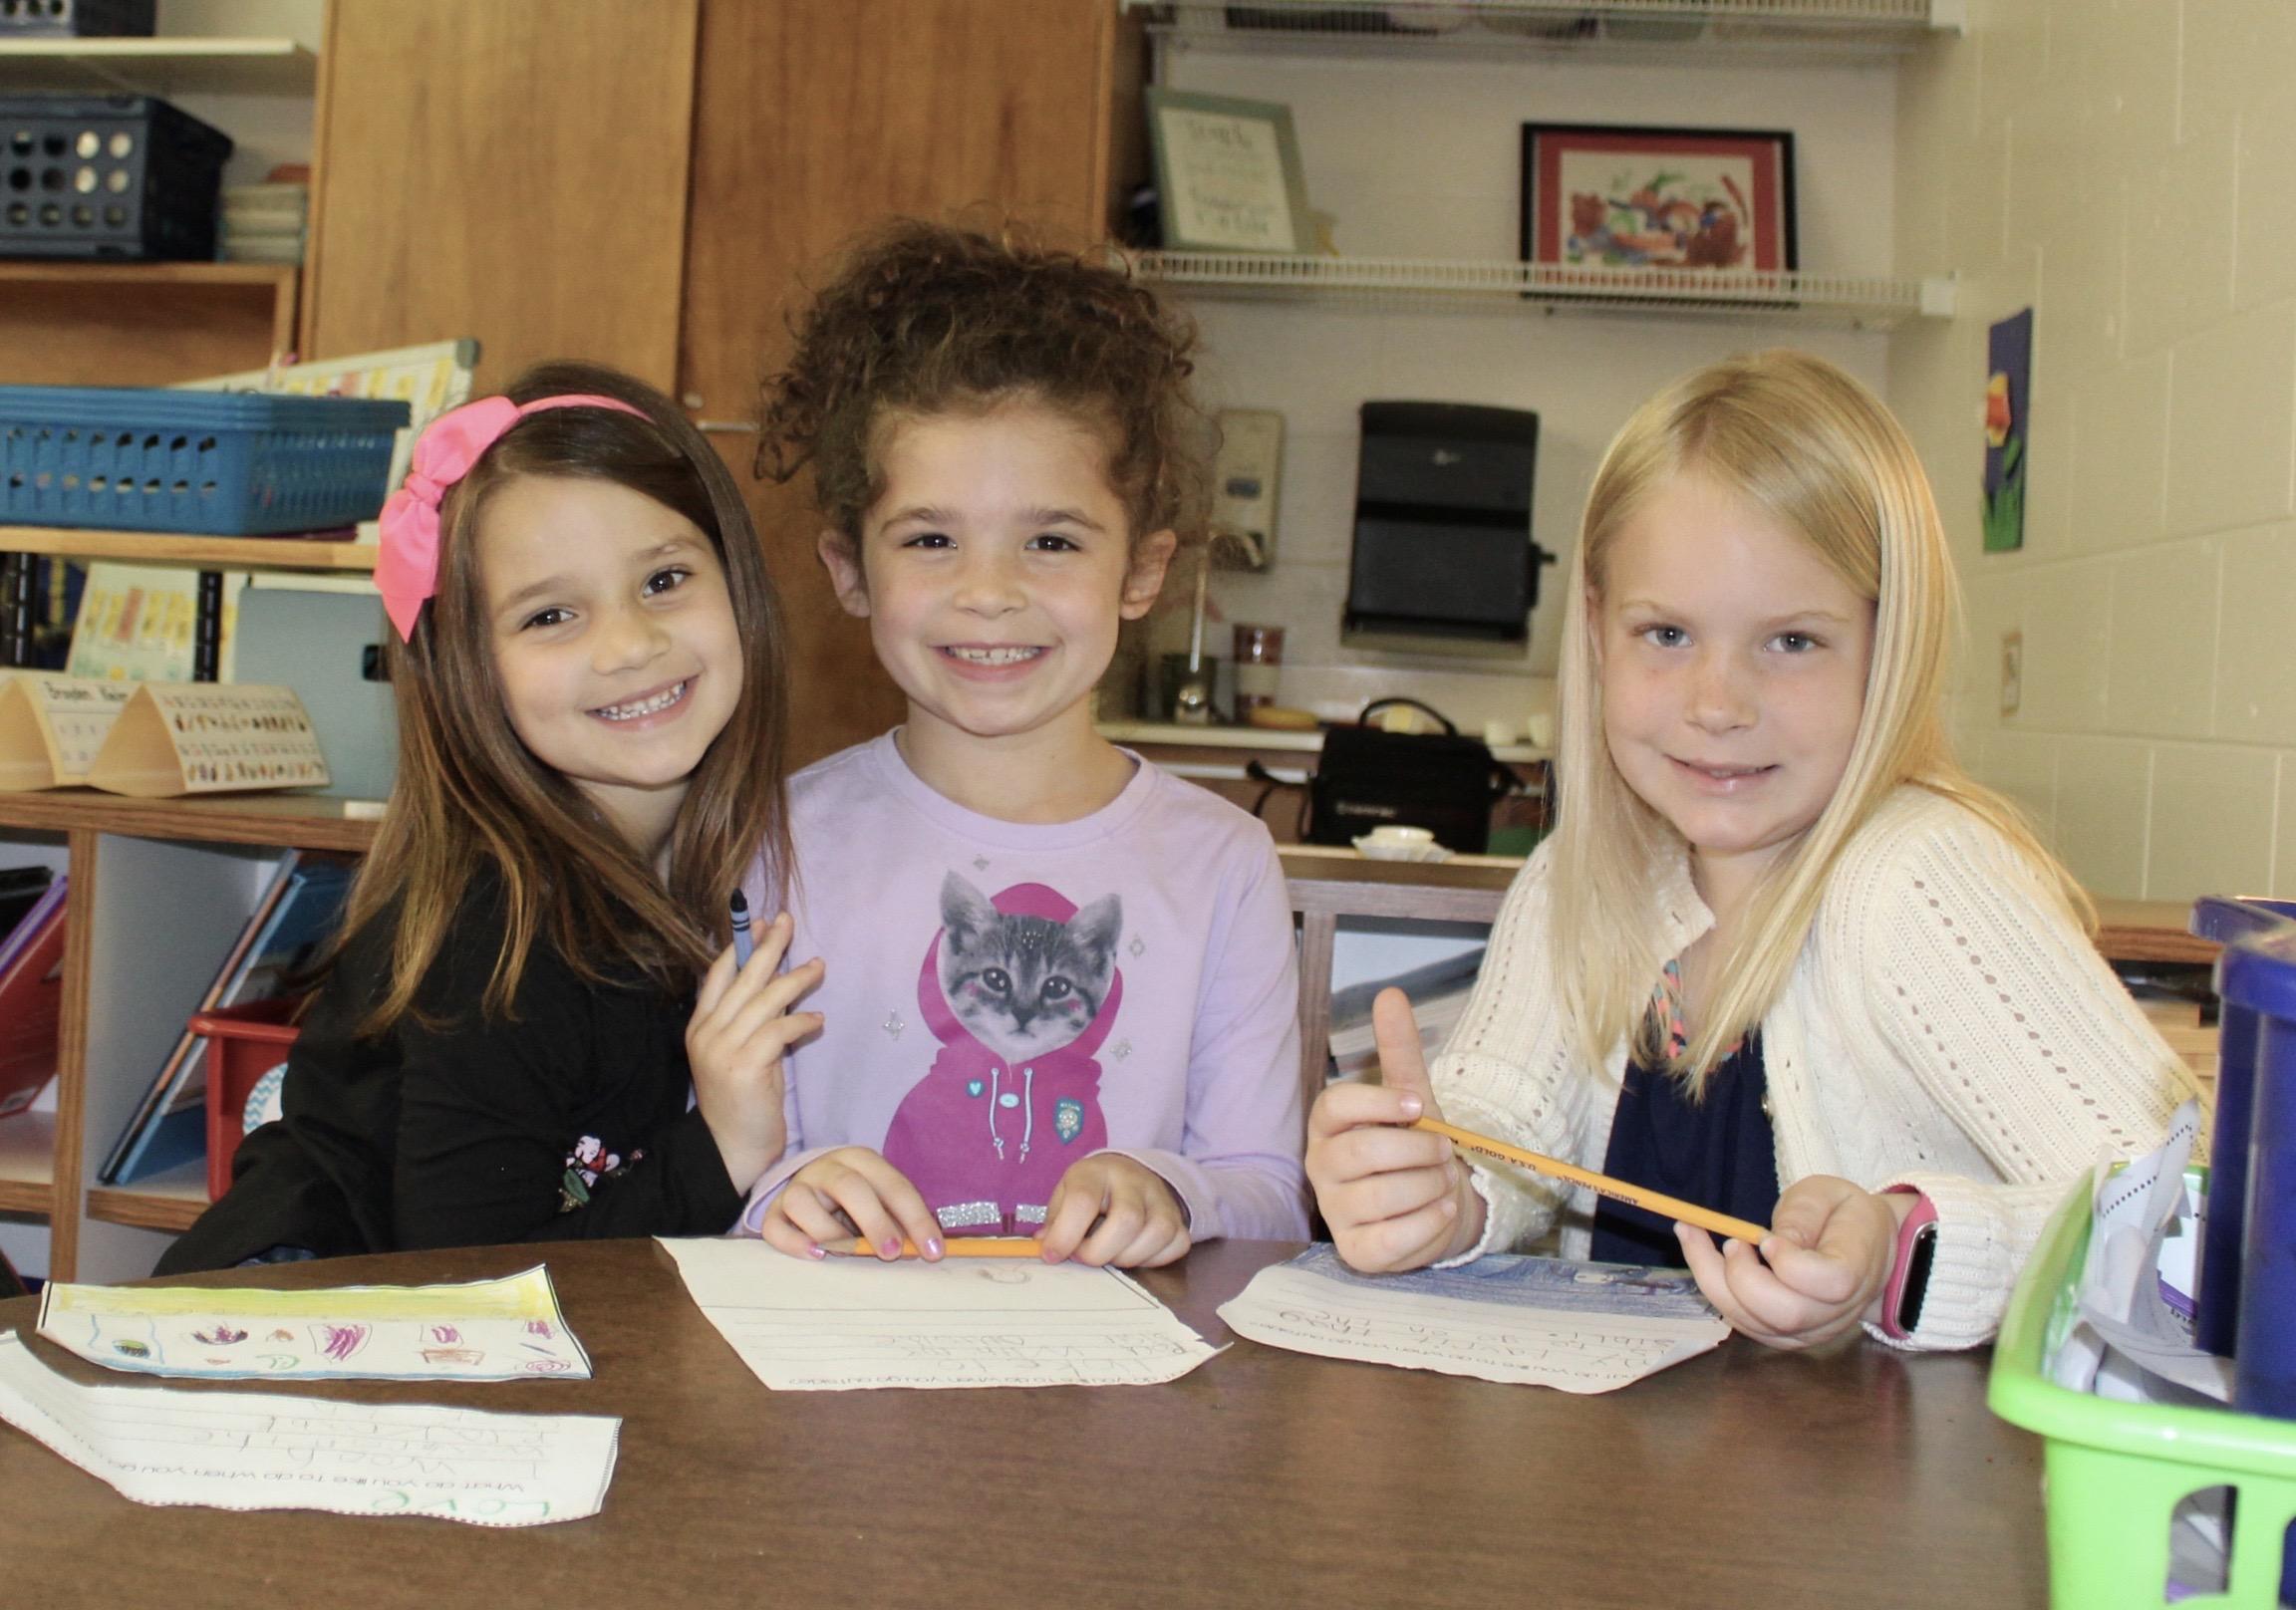 Three smiley girls working at desk